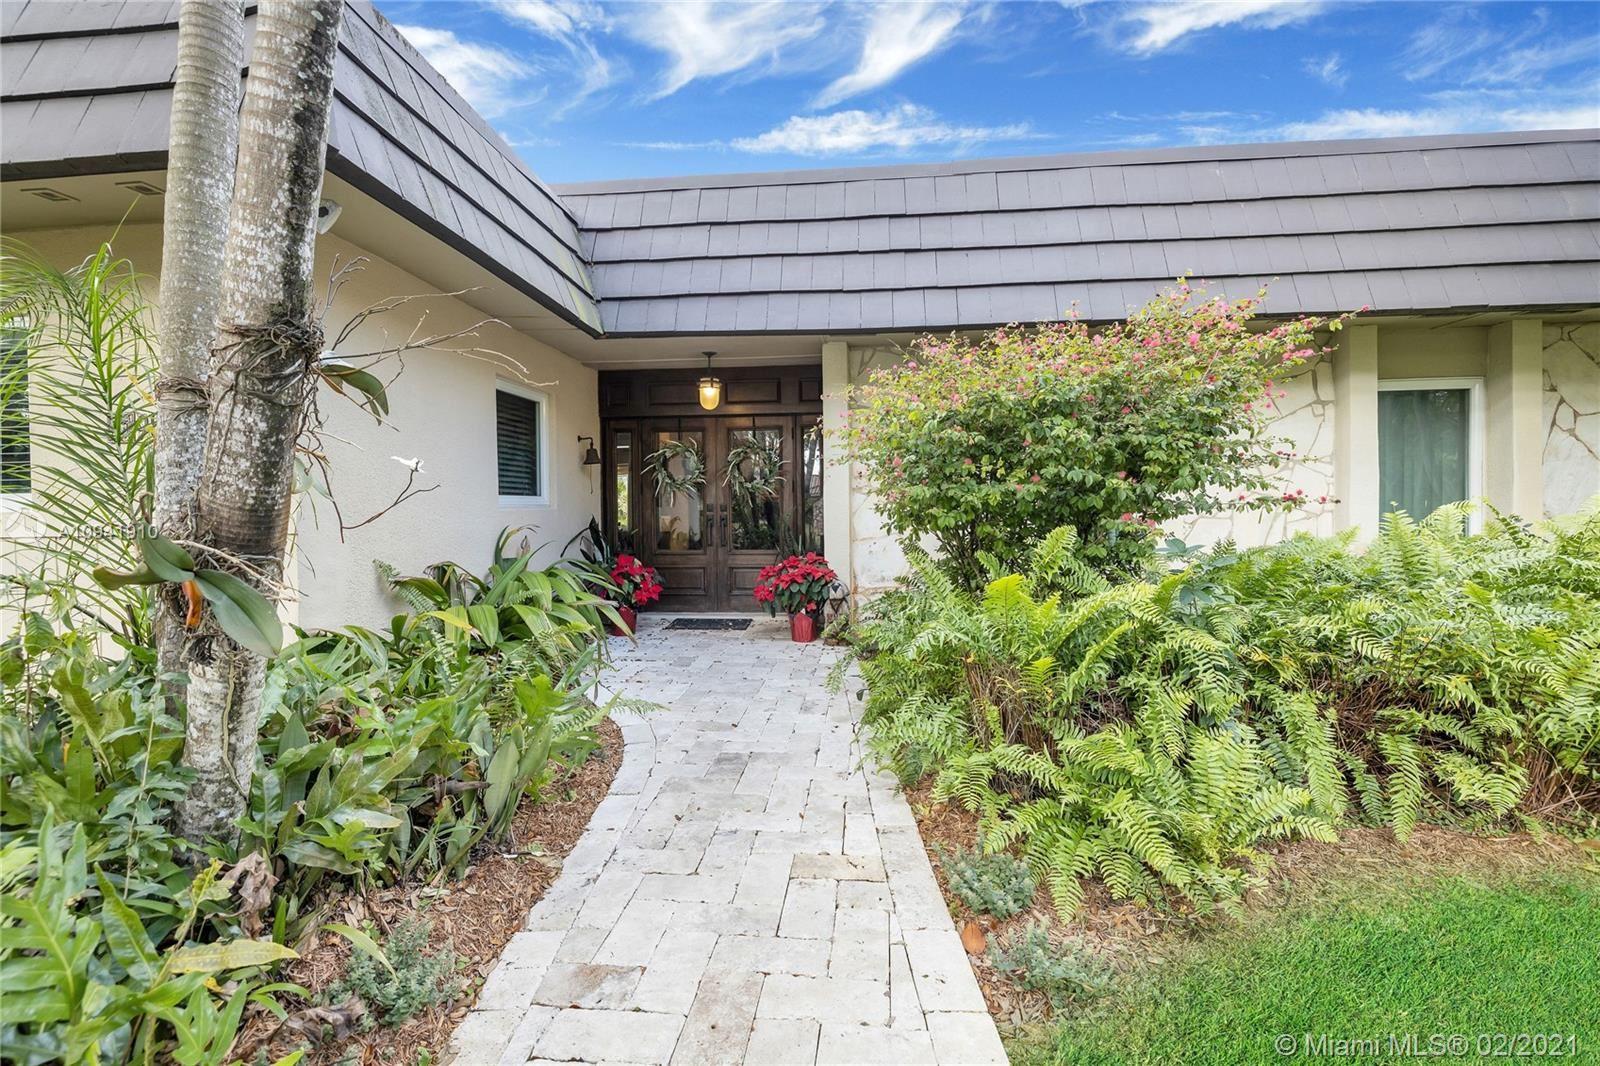 9800 SW 92nd Ave, Miami, FL 33176 - #: A10941910